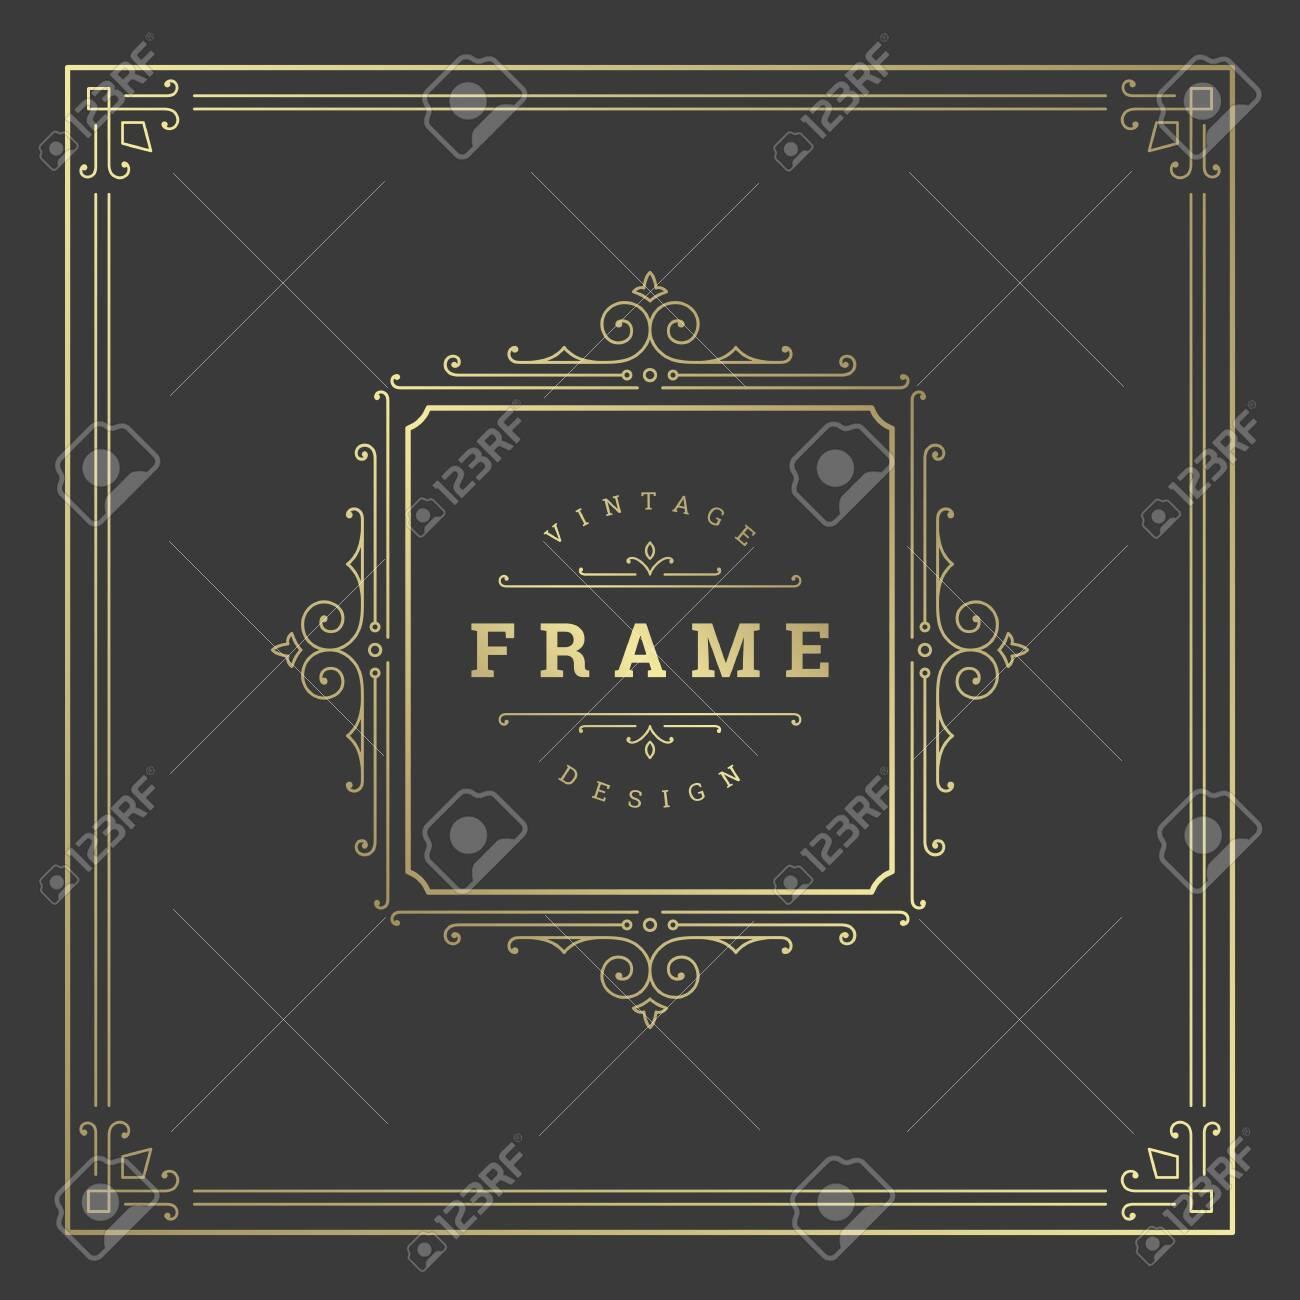 Vintage flourishes ornament swirls lines frame template vector illustration victorian ornate border for greeting cards - 152669765